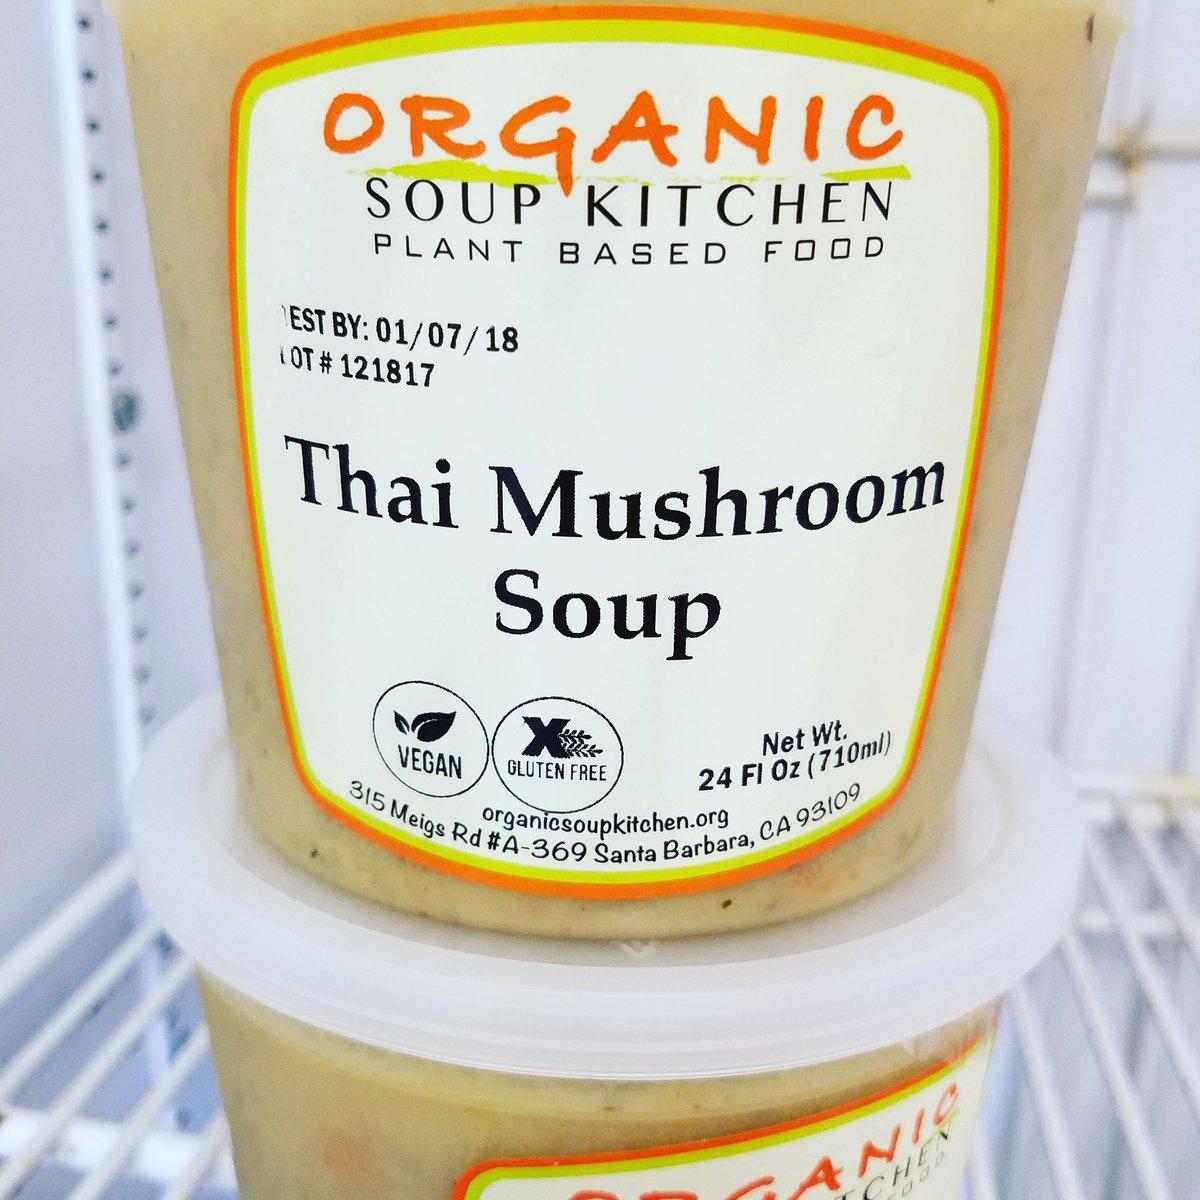 Organic Soup Kitchen Organic soup kitchen organicsoups twitter 0 replies 0 retweets 1 like workwithnaturefo